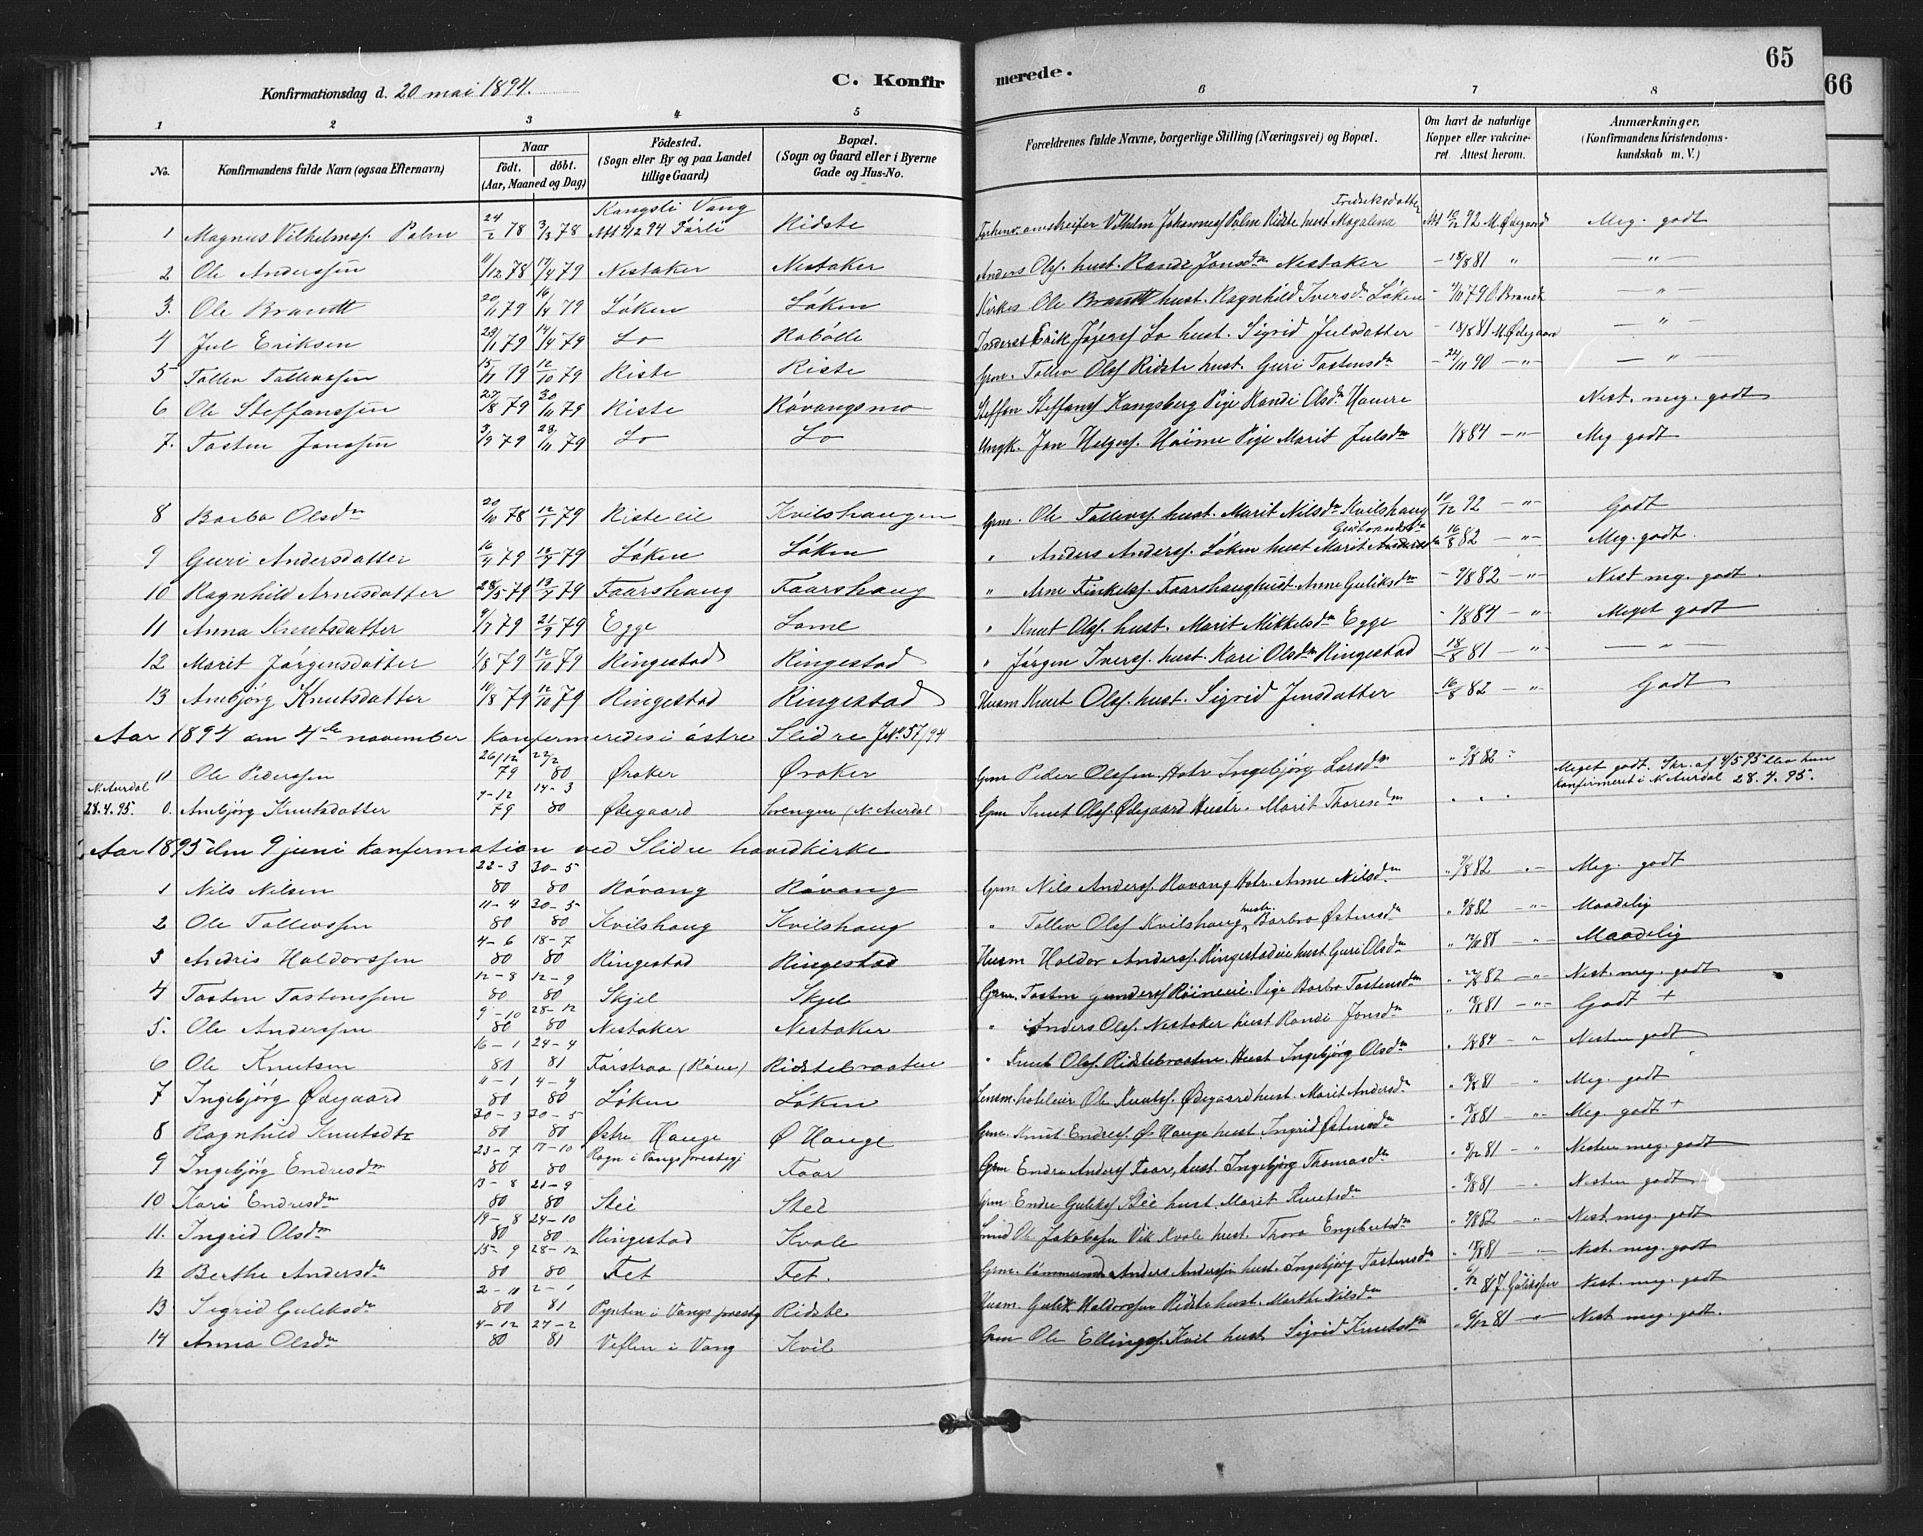 SAH, Vestre Slidre prestekontor, Klokkerbok nr. 6, 1881-1915, s. 65